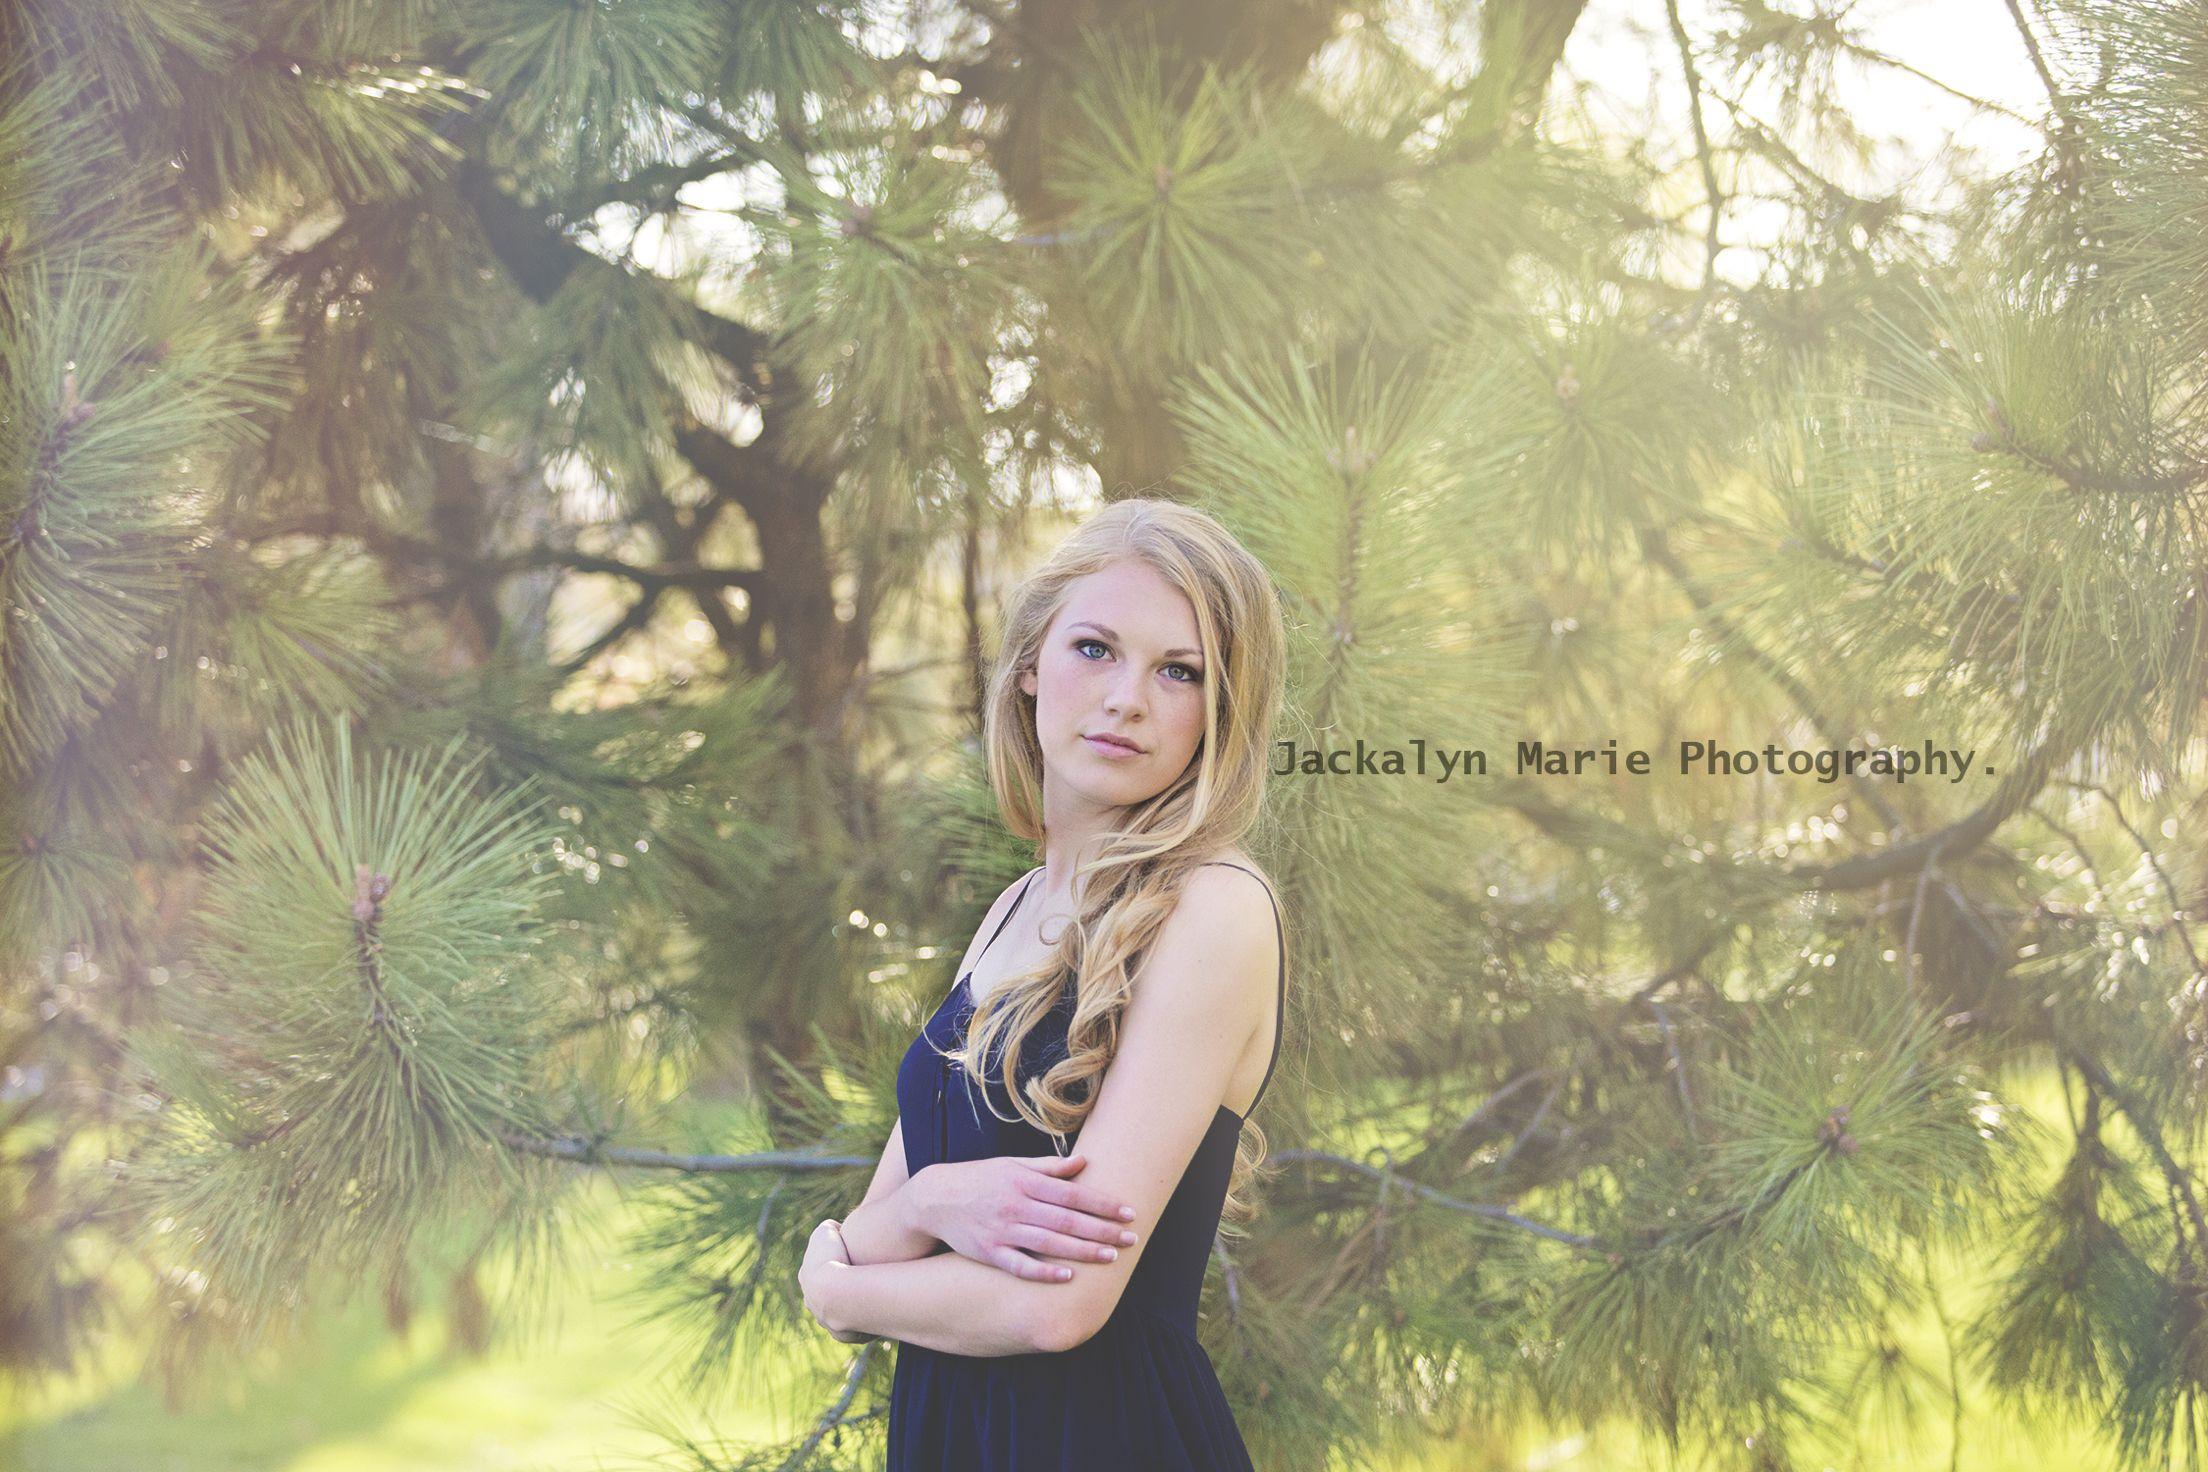 #seniorphotography #appletonwisconsin#jackalynmariephotography